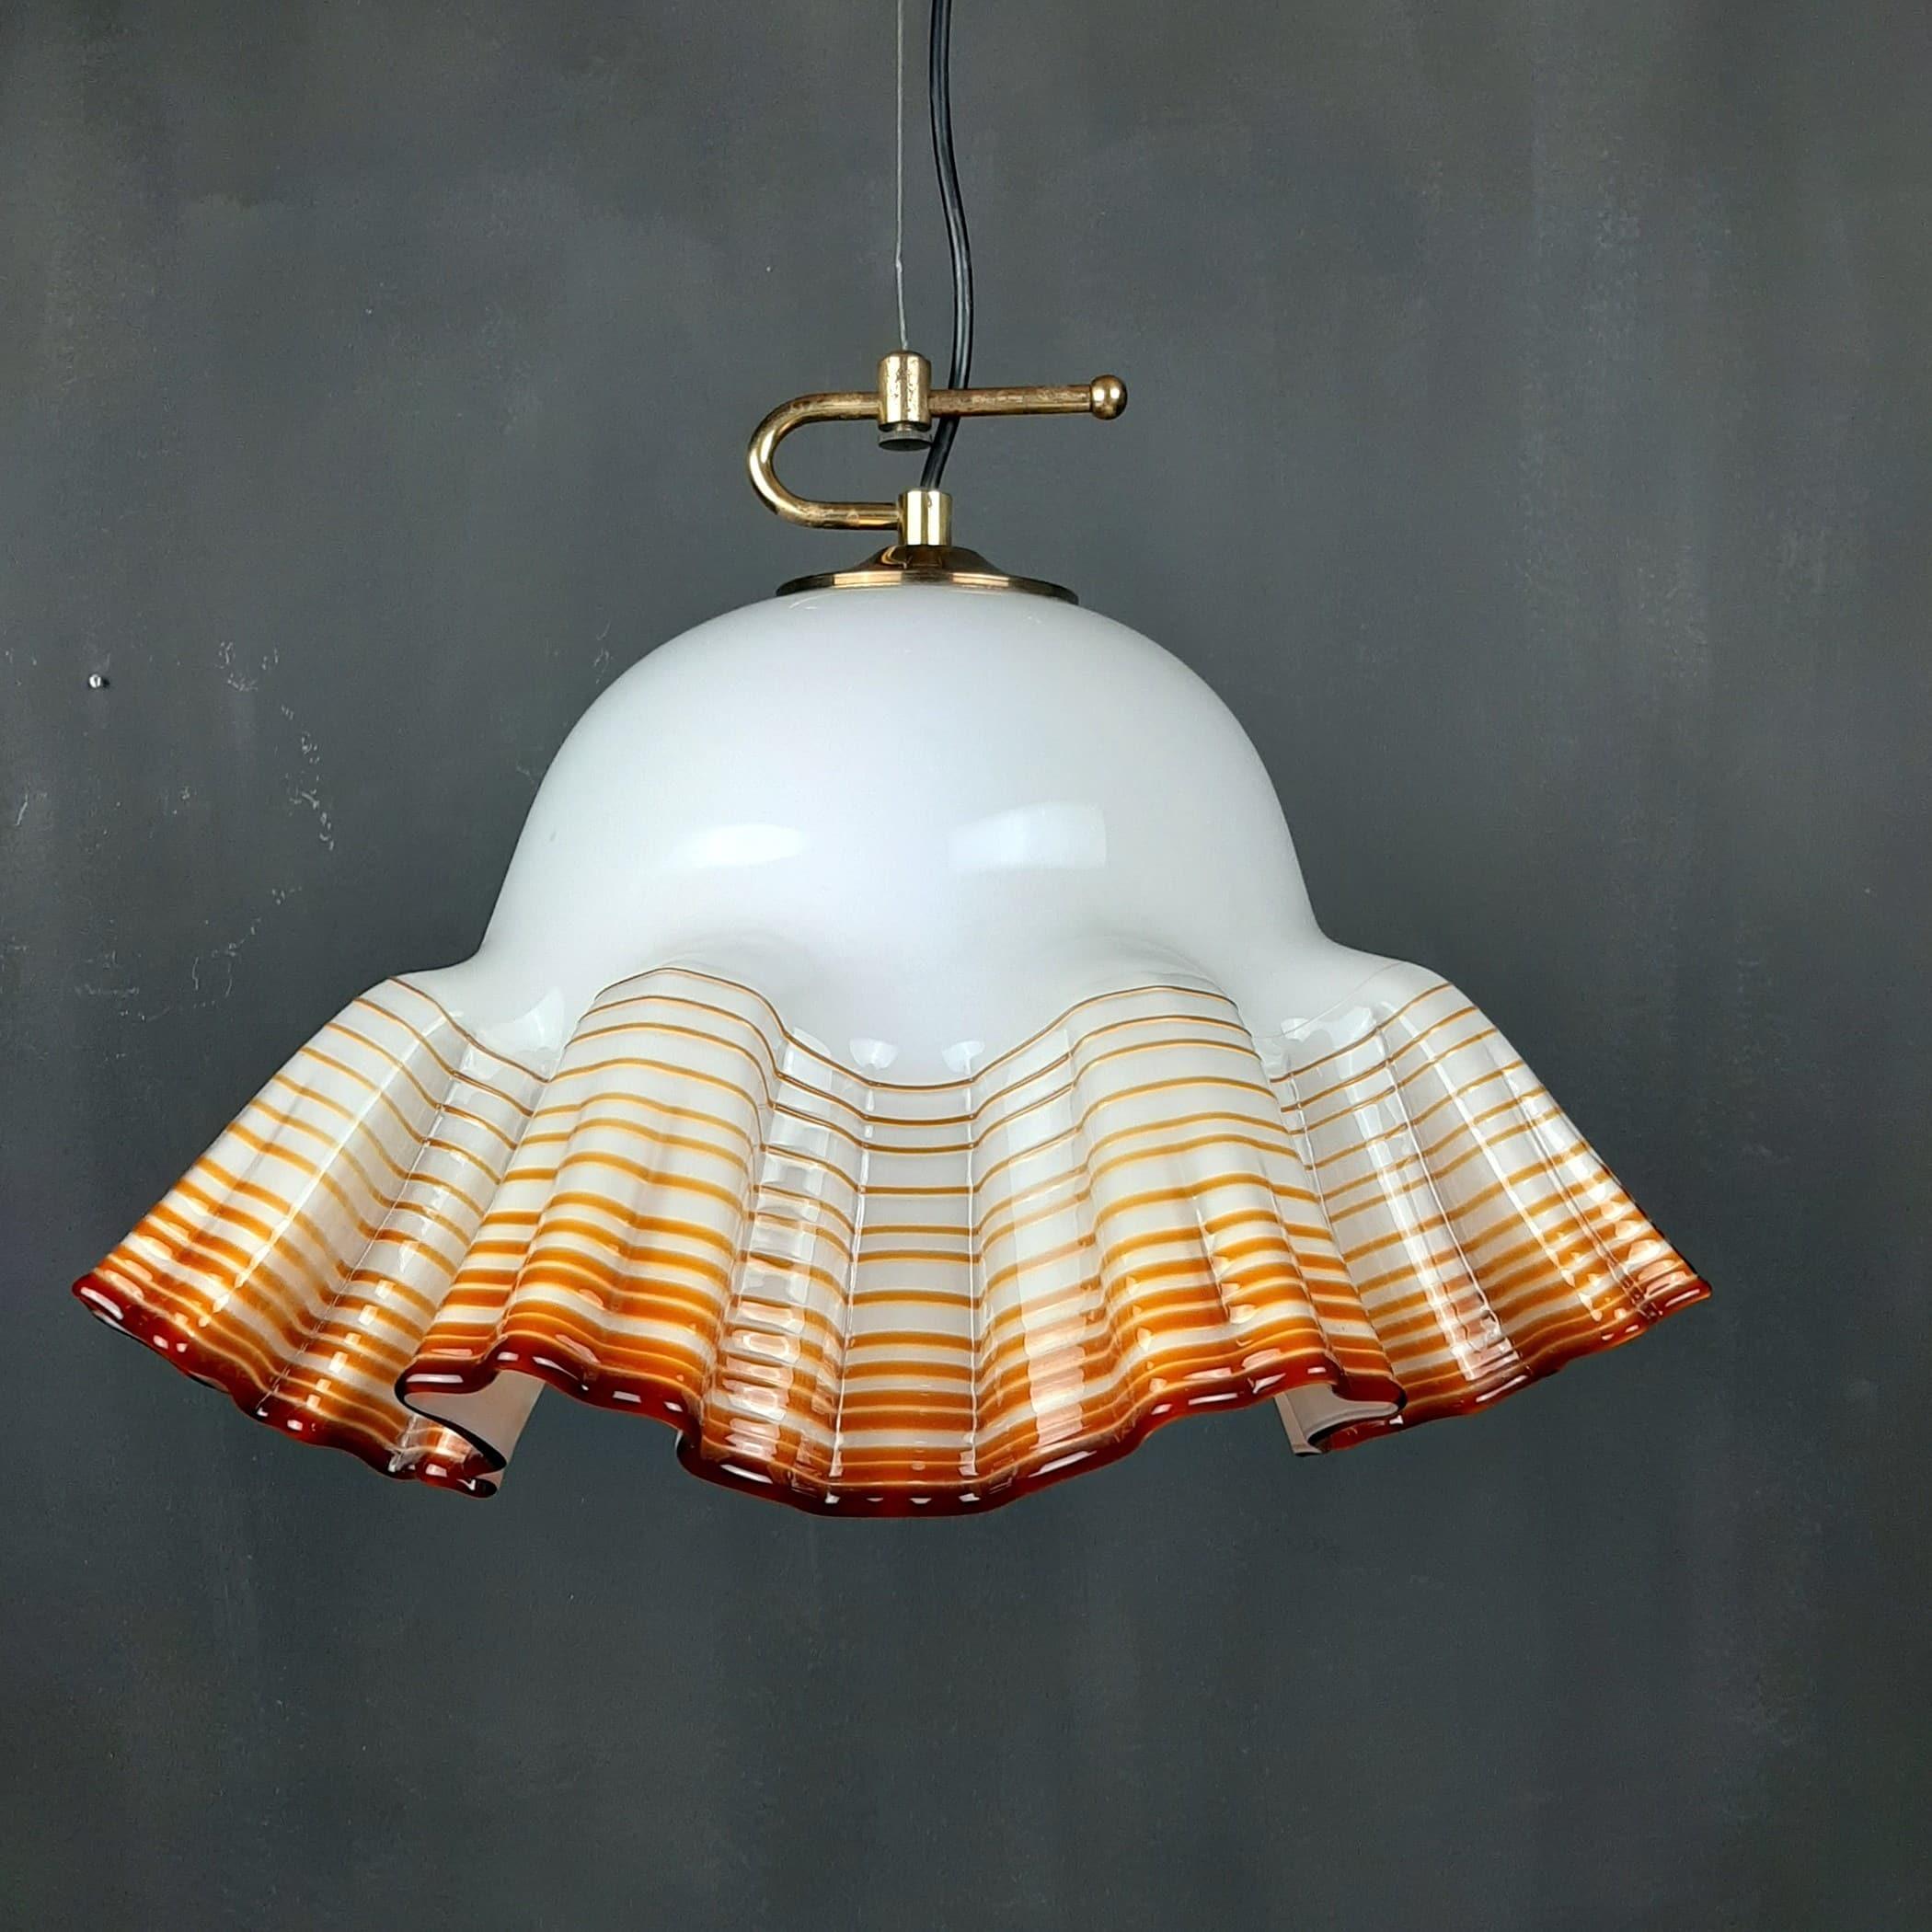 Vintage murano glass pendant lamp De Majo Italy 1970s